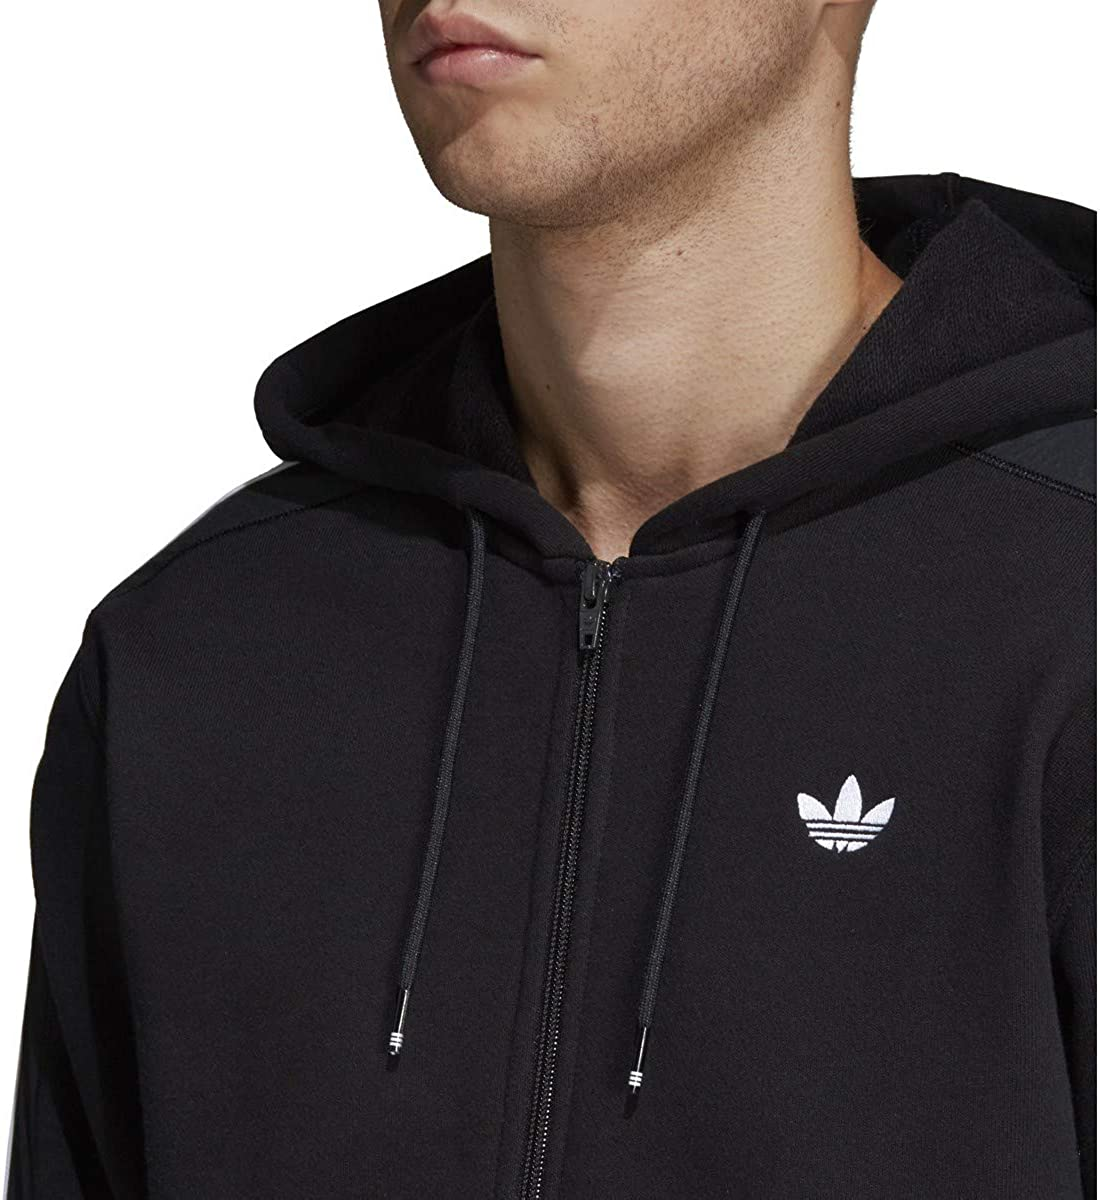 Adidas Mens Essentials 3-Stripes Full-Zip Fleece Hooded Sweatshirt